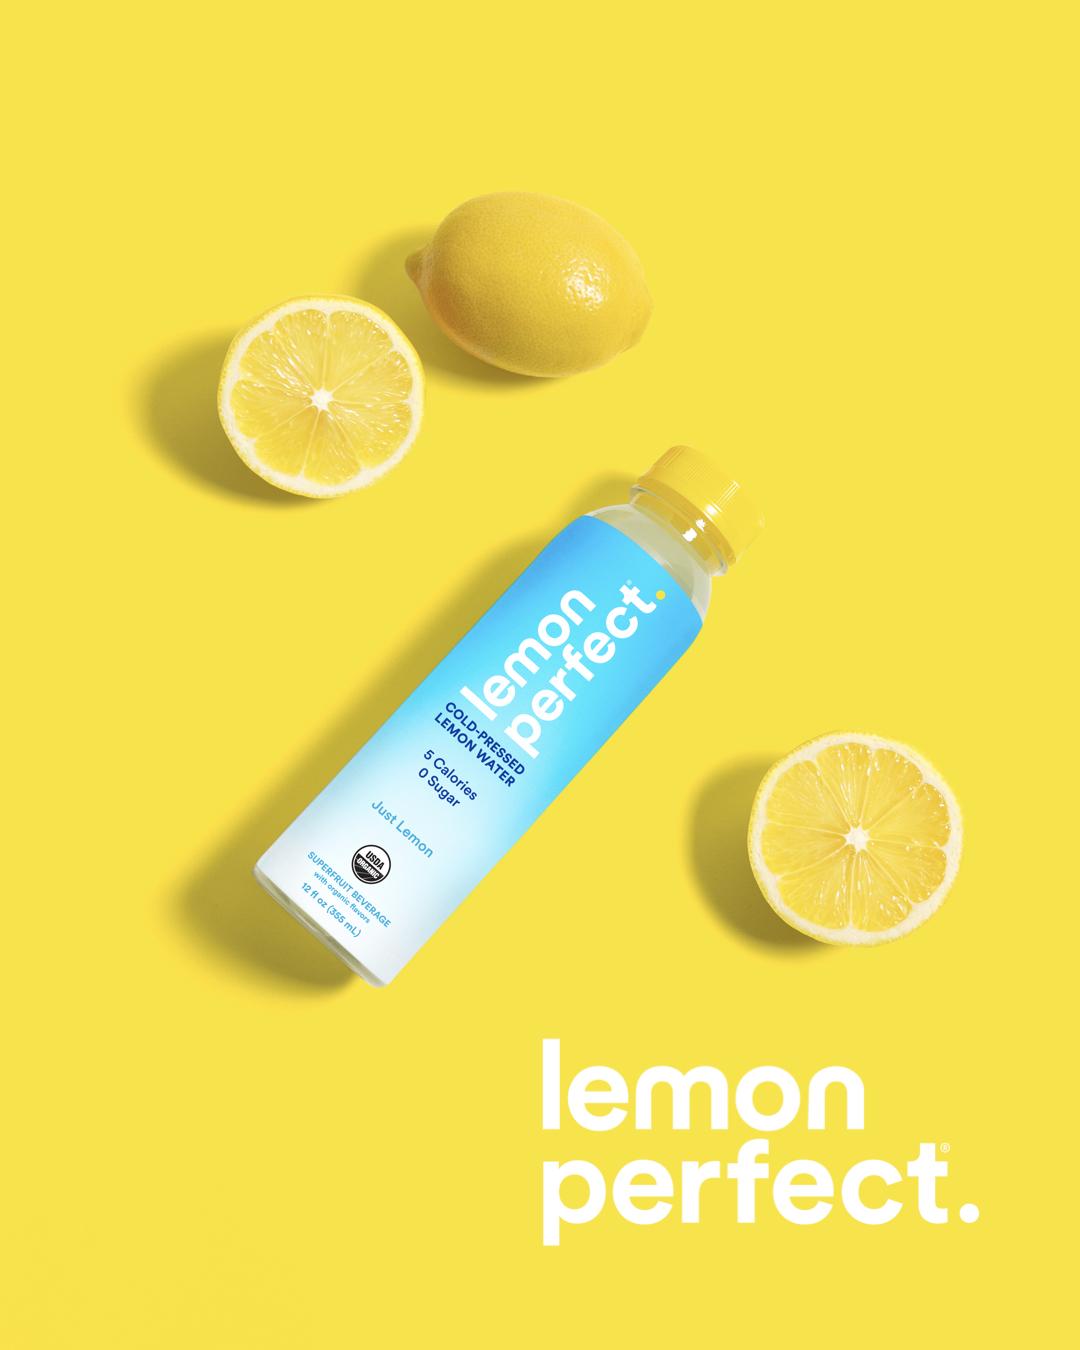 lemon perfect cds west 2019.001.jpeg